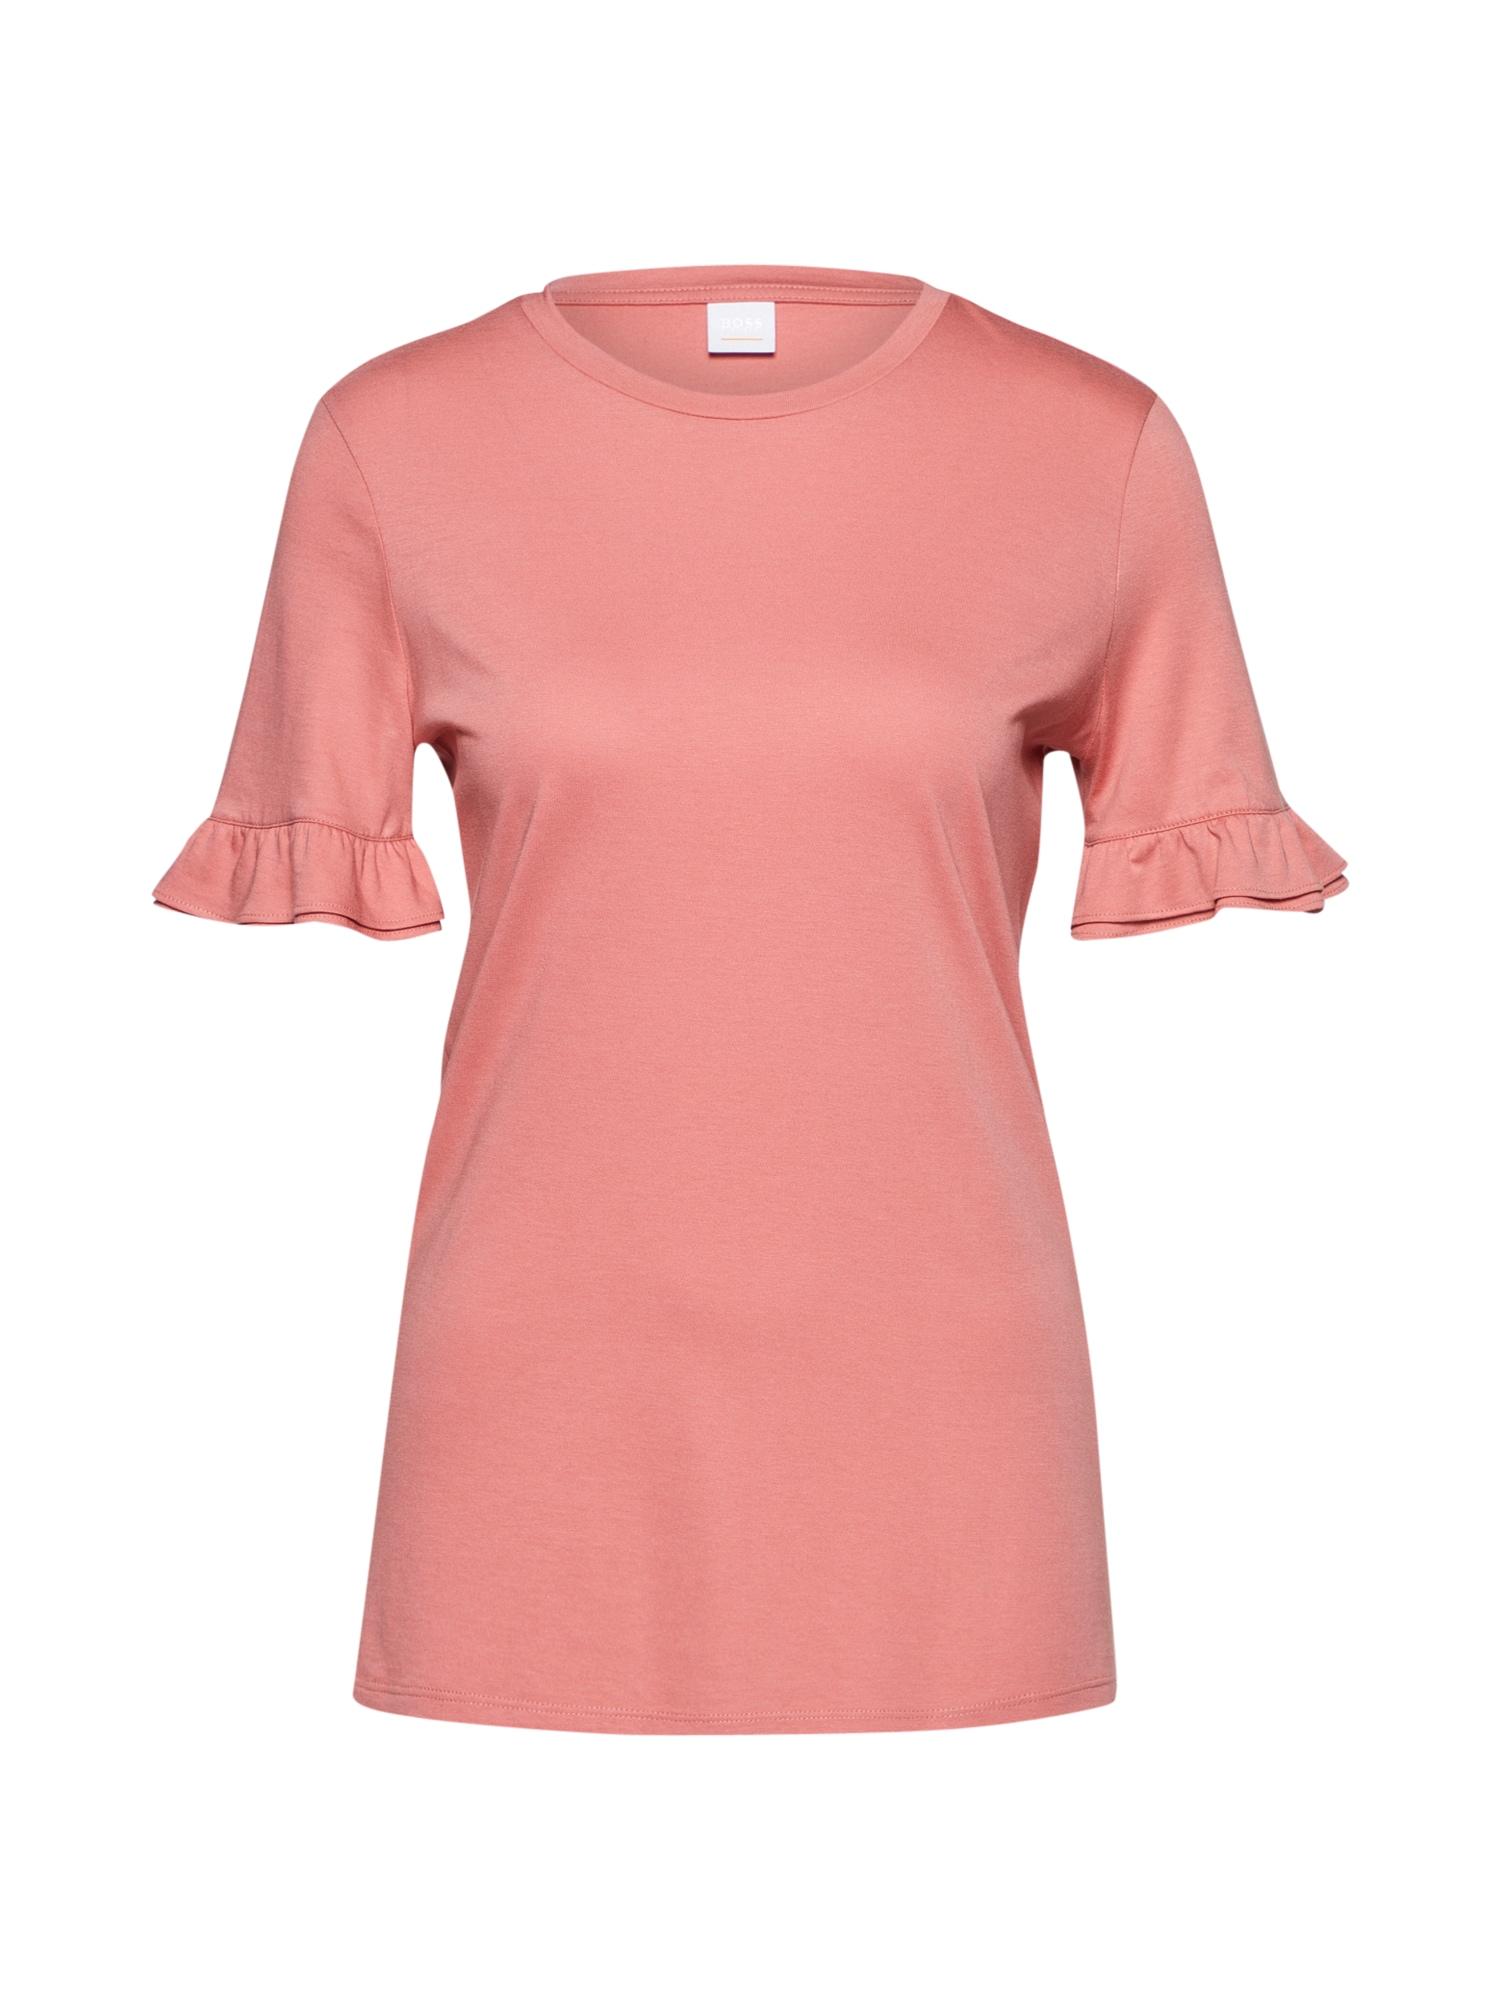 Tričko Takatja růžová BOSS